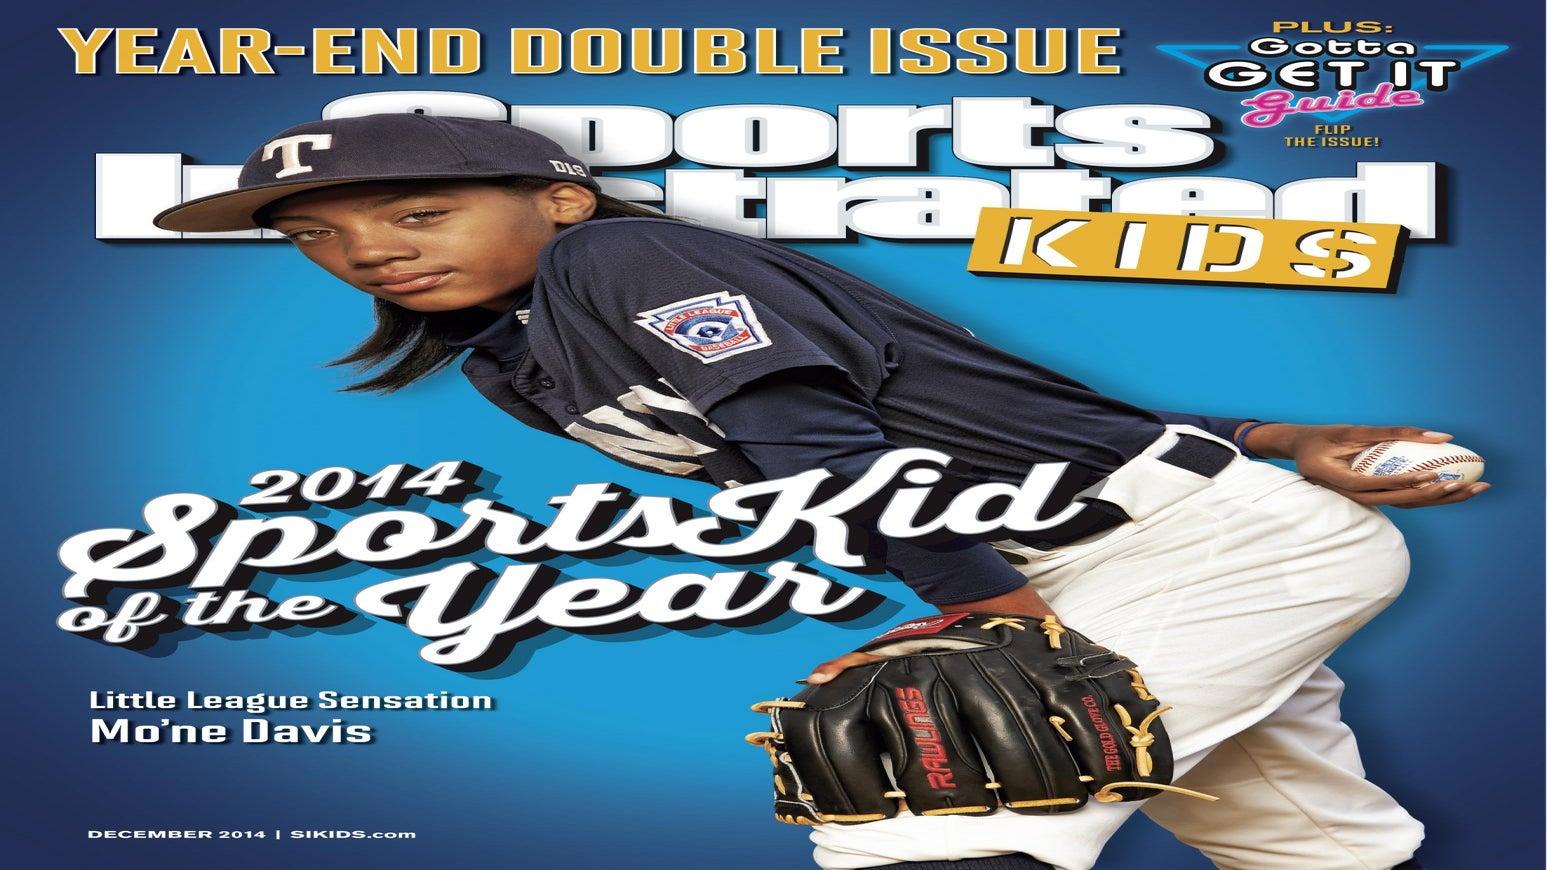 Mo'ne Davis Is 'Sports Illustrated Kids' SportsKid of the Year!